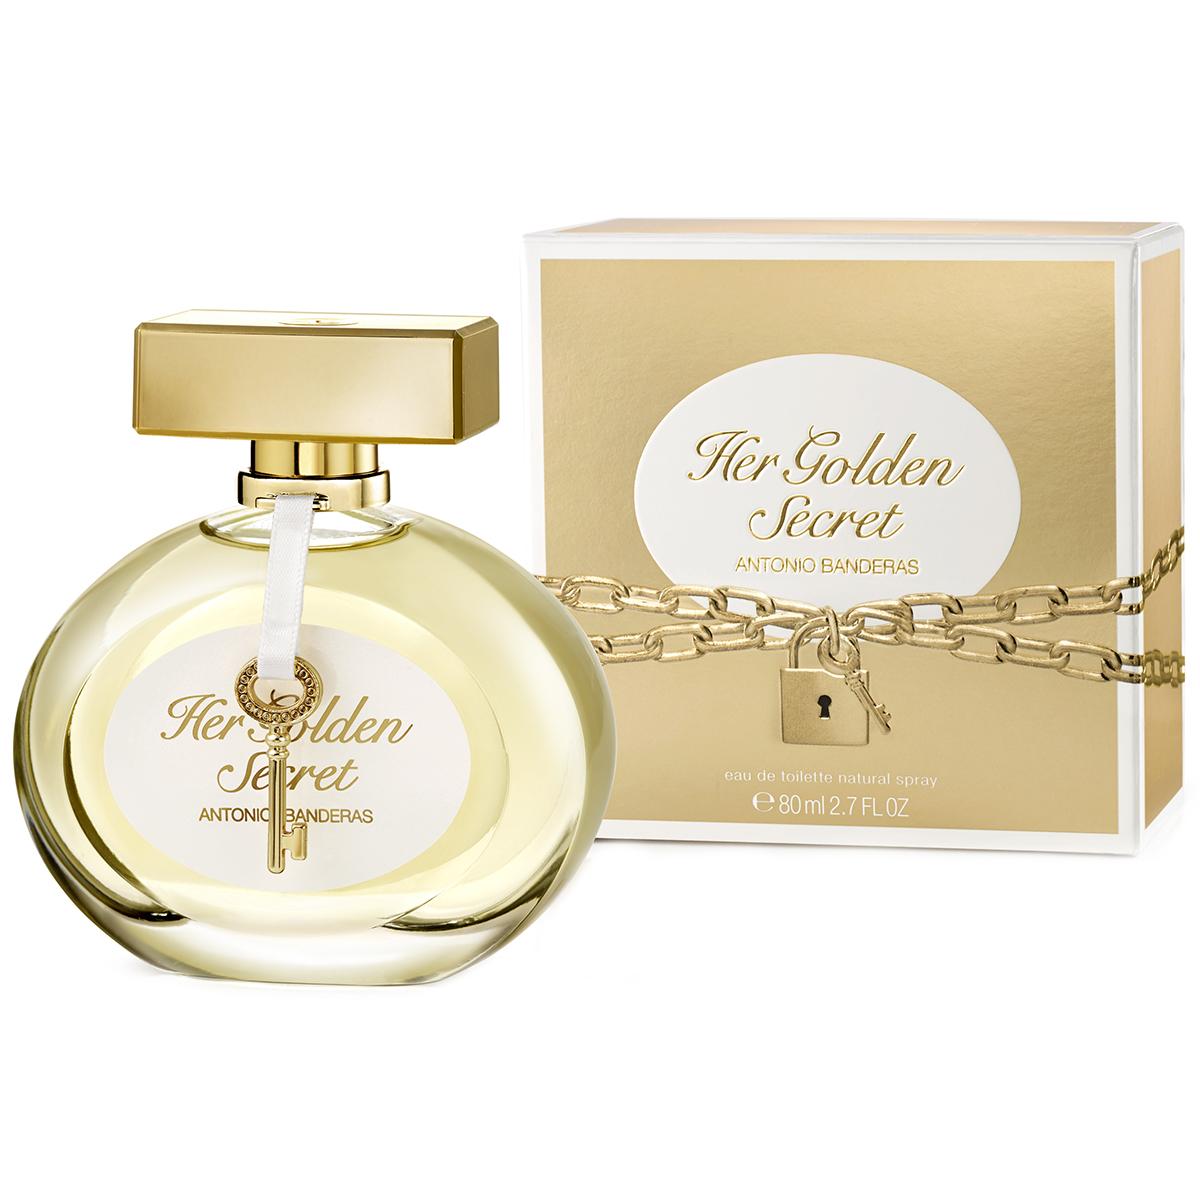 Apa de Toaleta Antonio Banderas Her Golden Secret